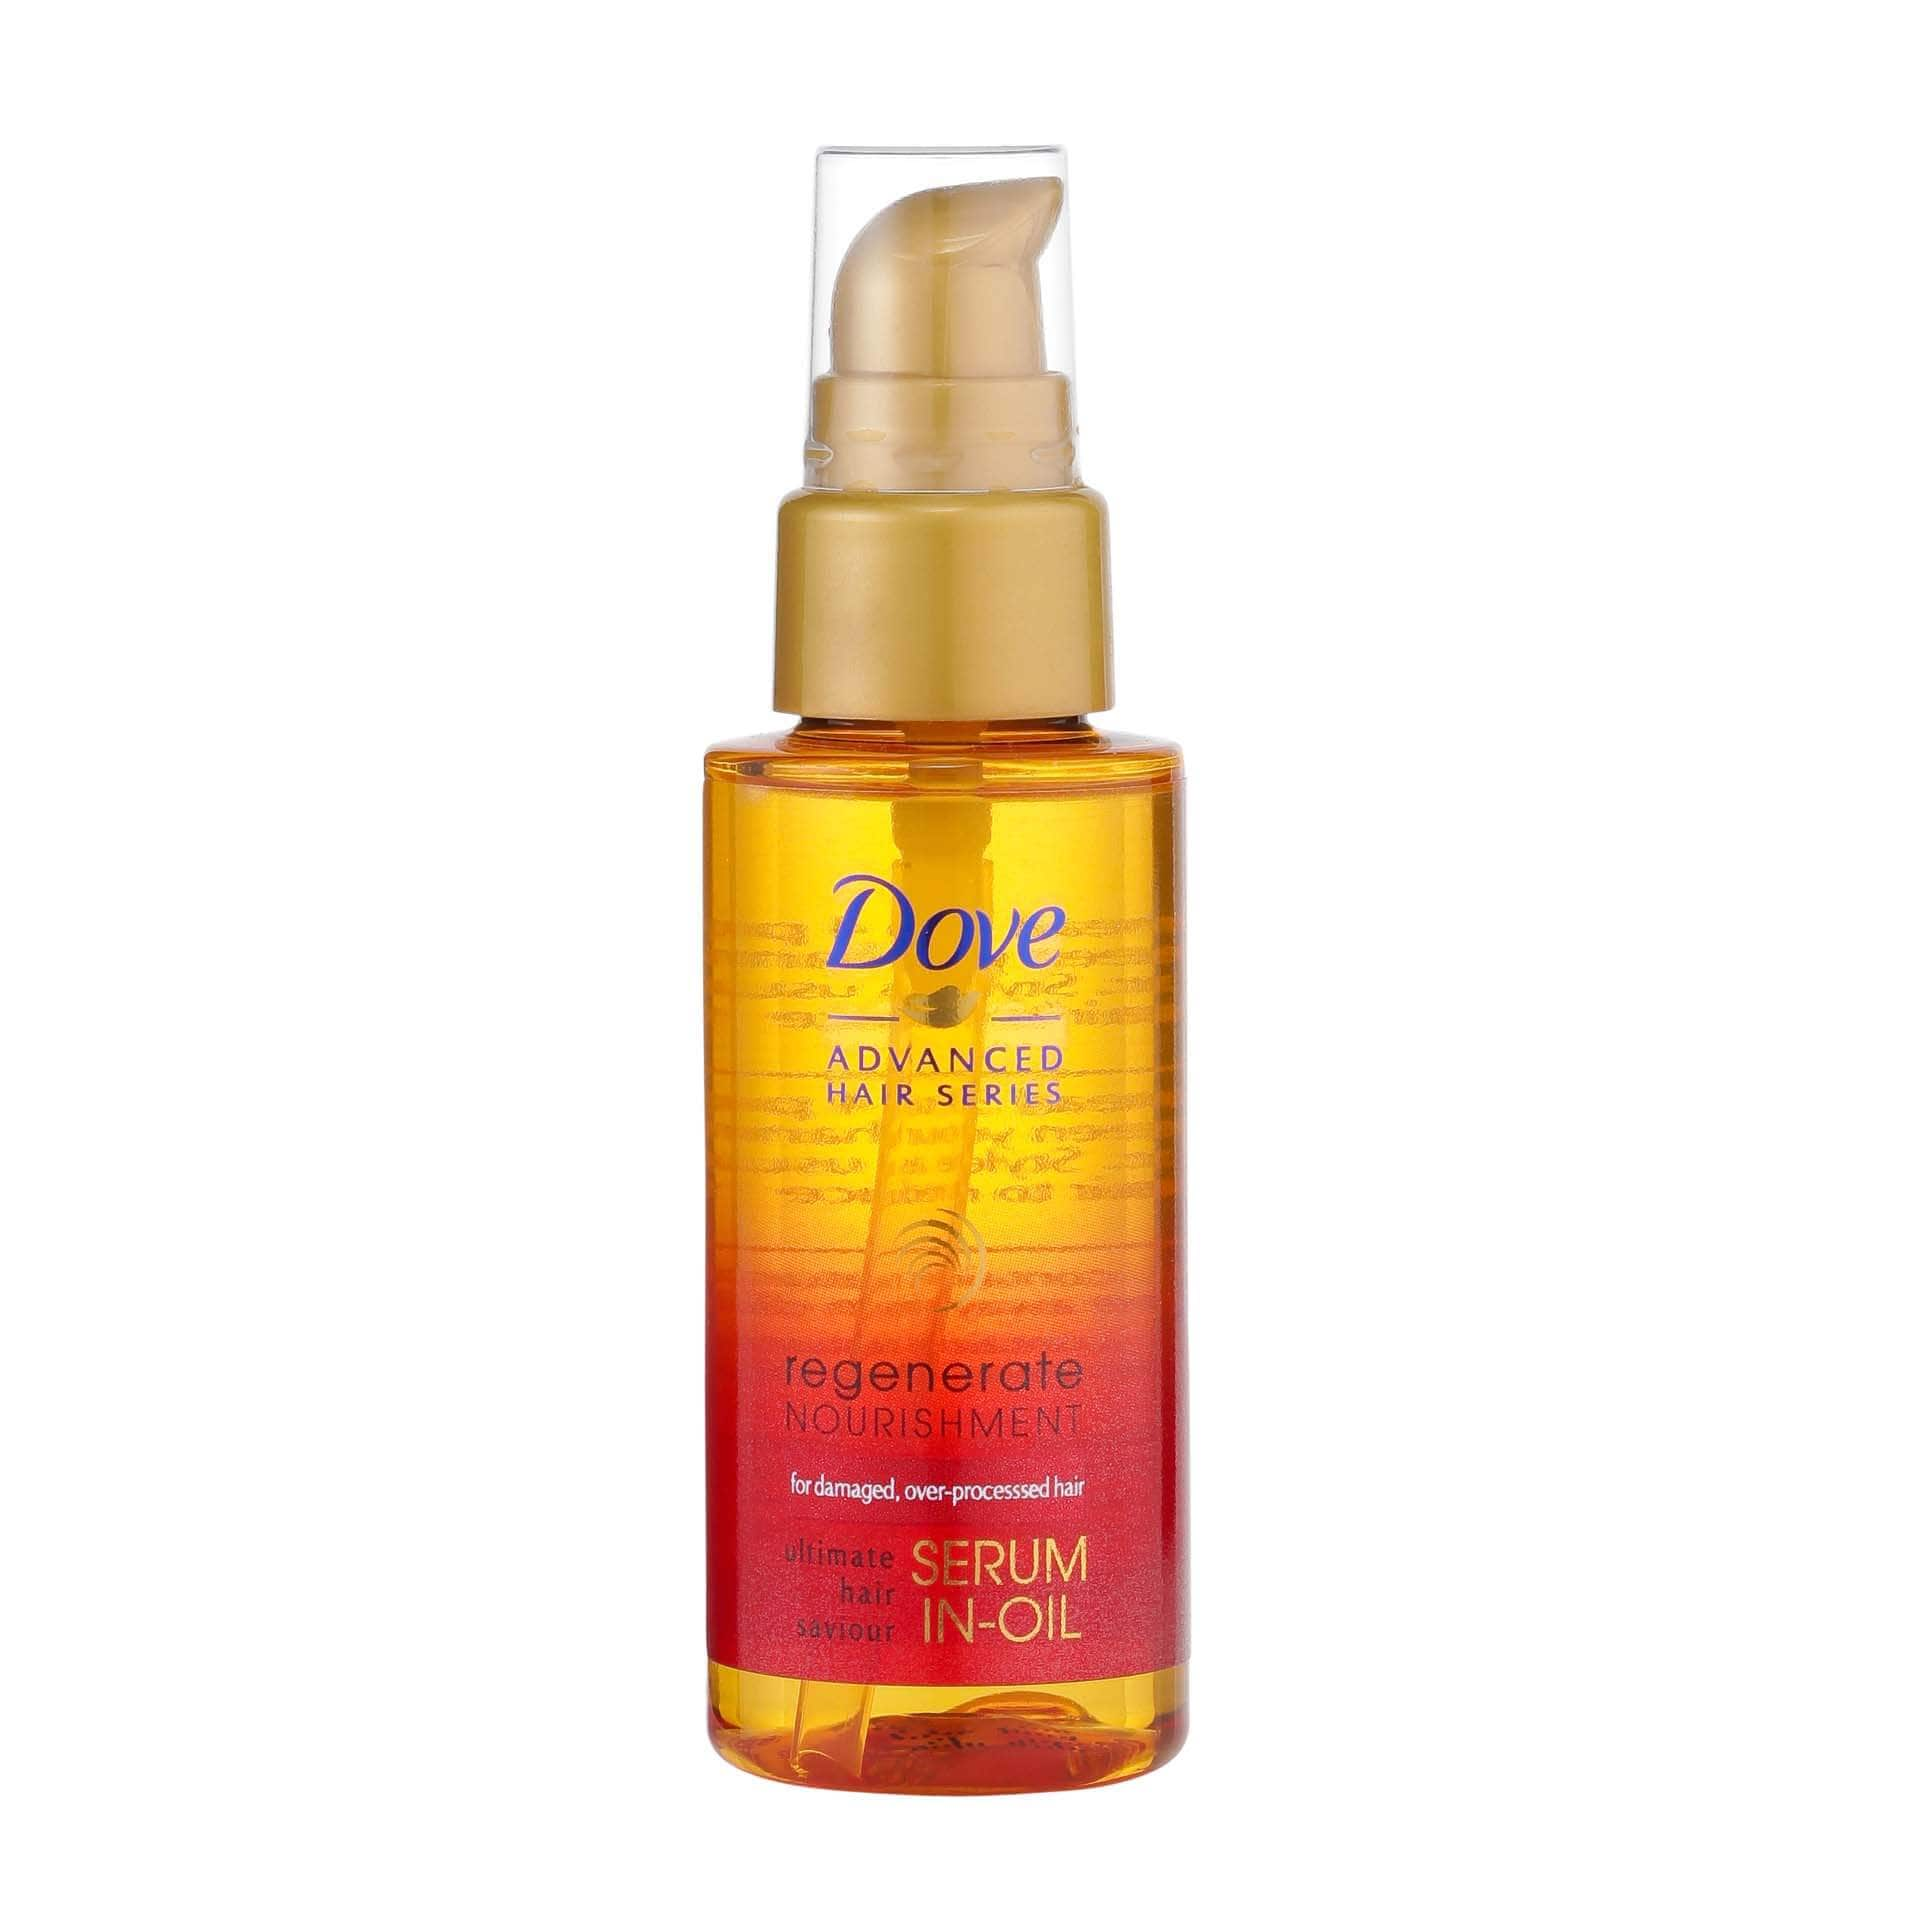 Dove Advanced Hair Series Regenerate Nourishment Serum-In-Oil